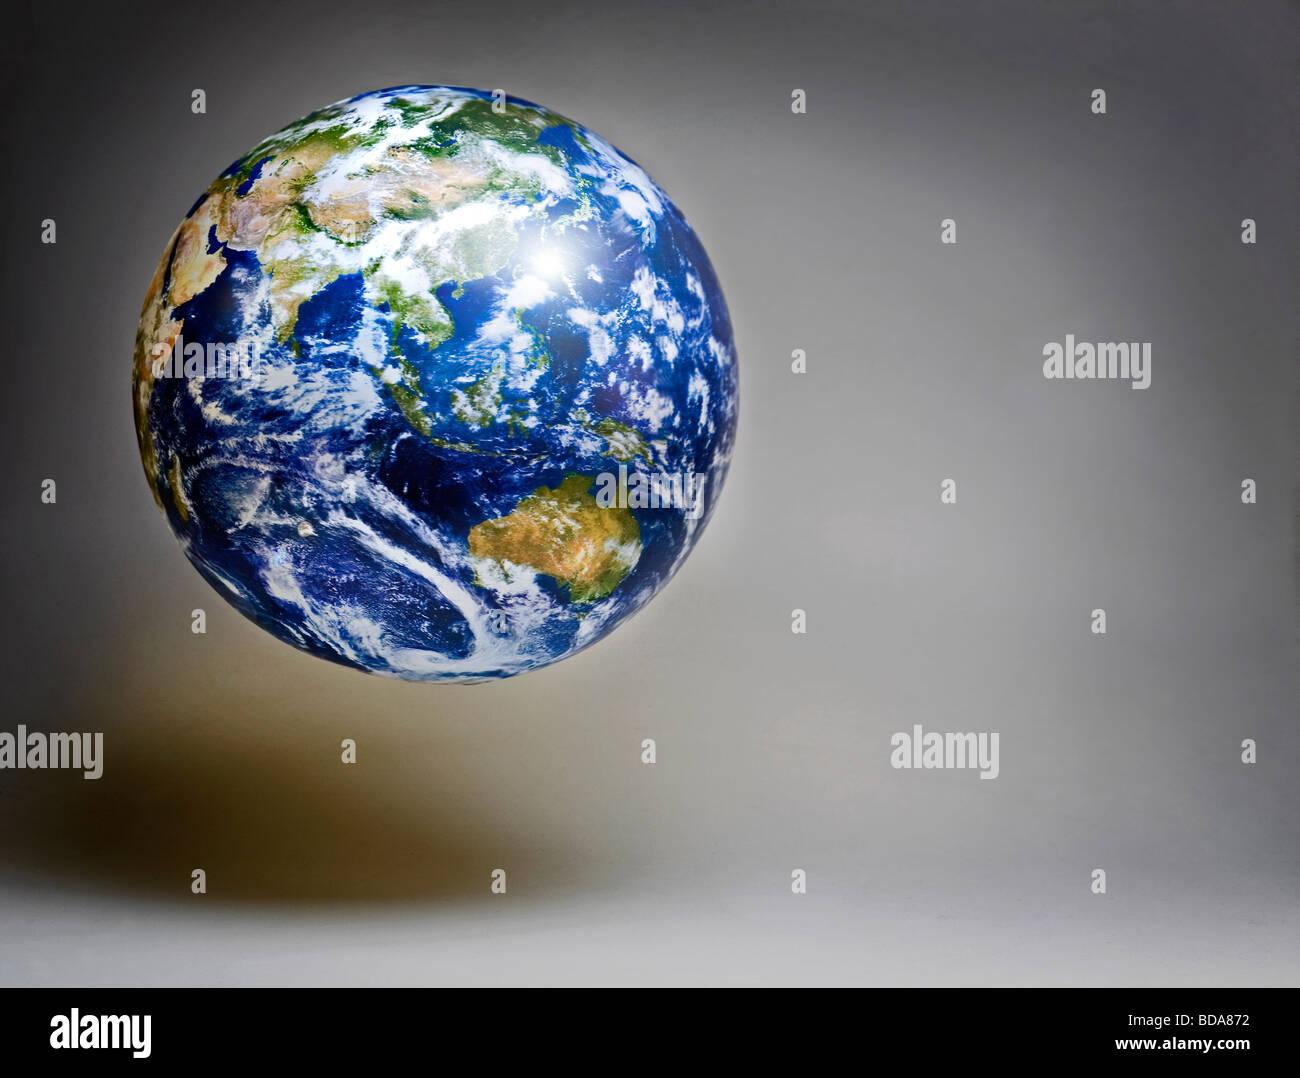 Still shot of a world globe - Stock Image